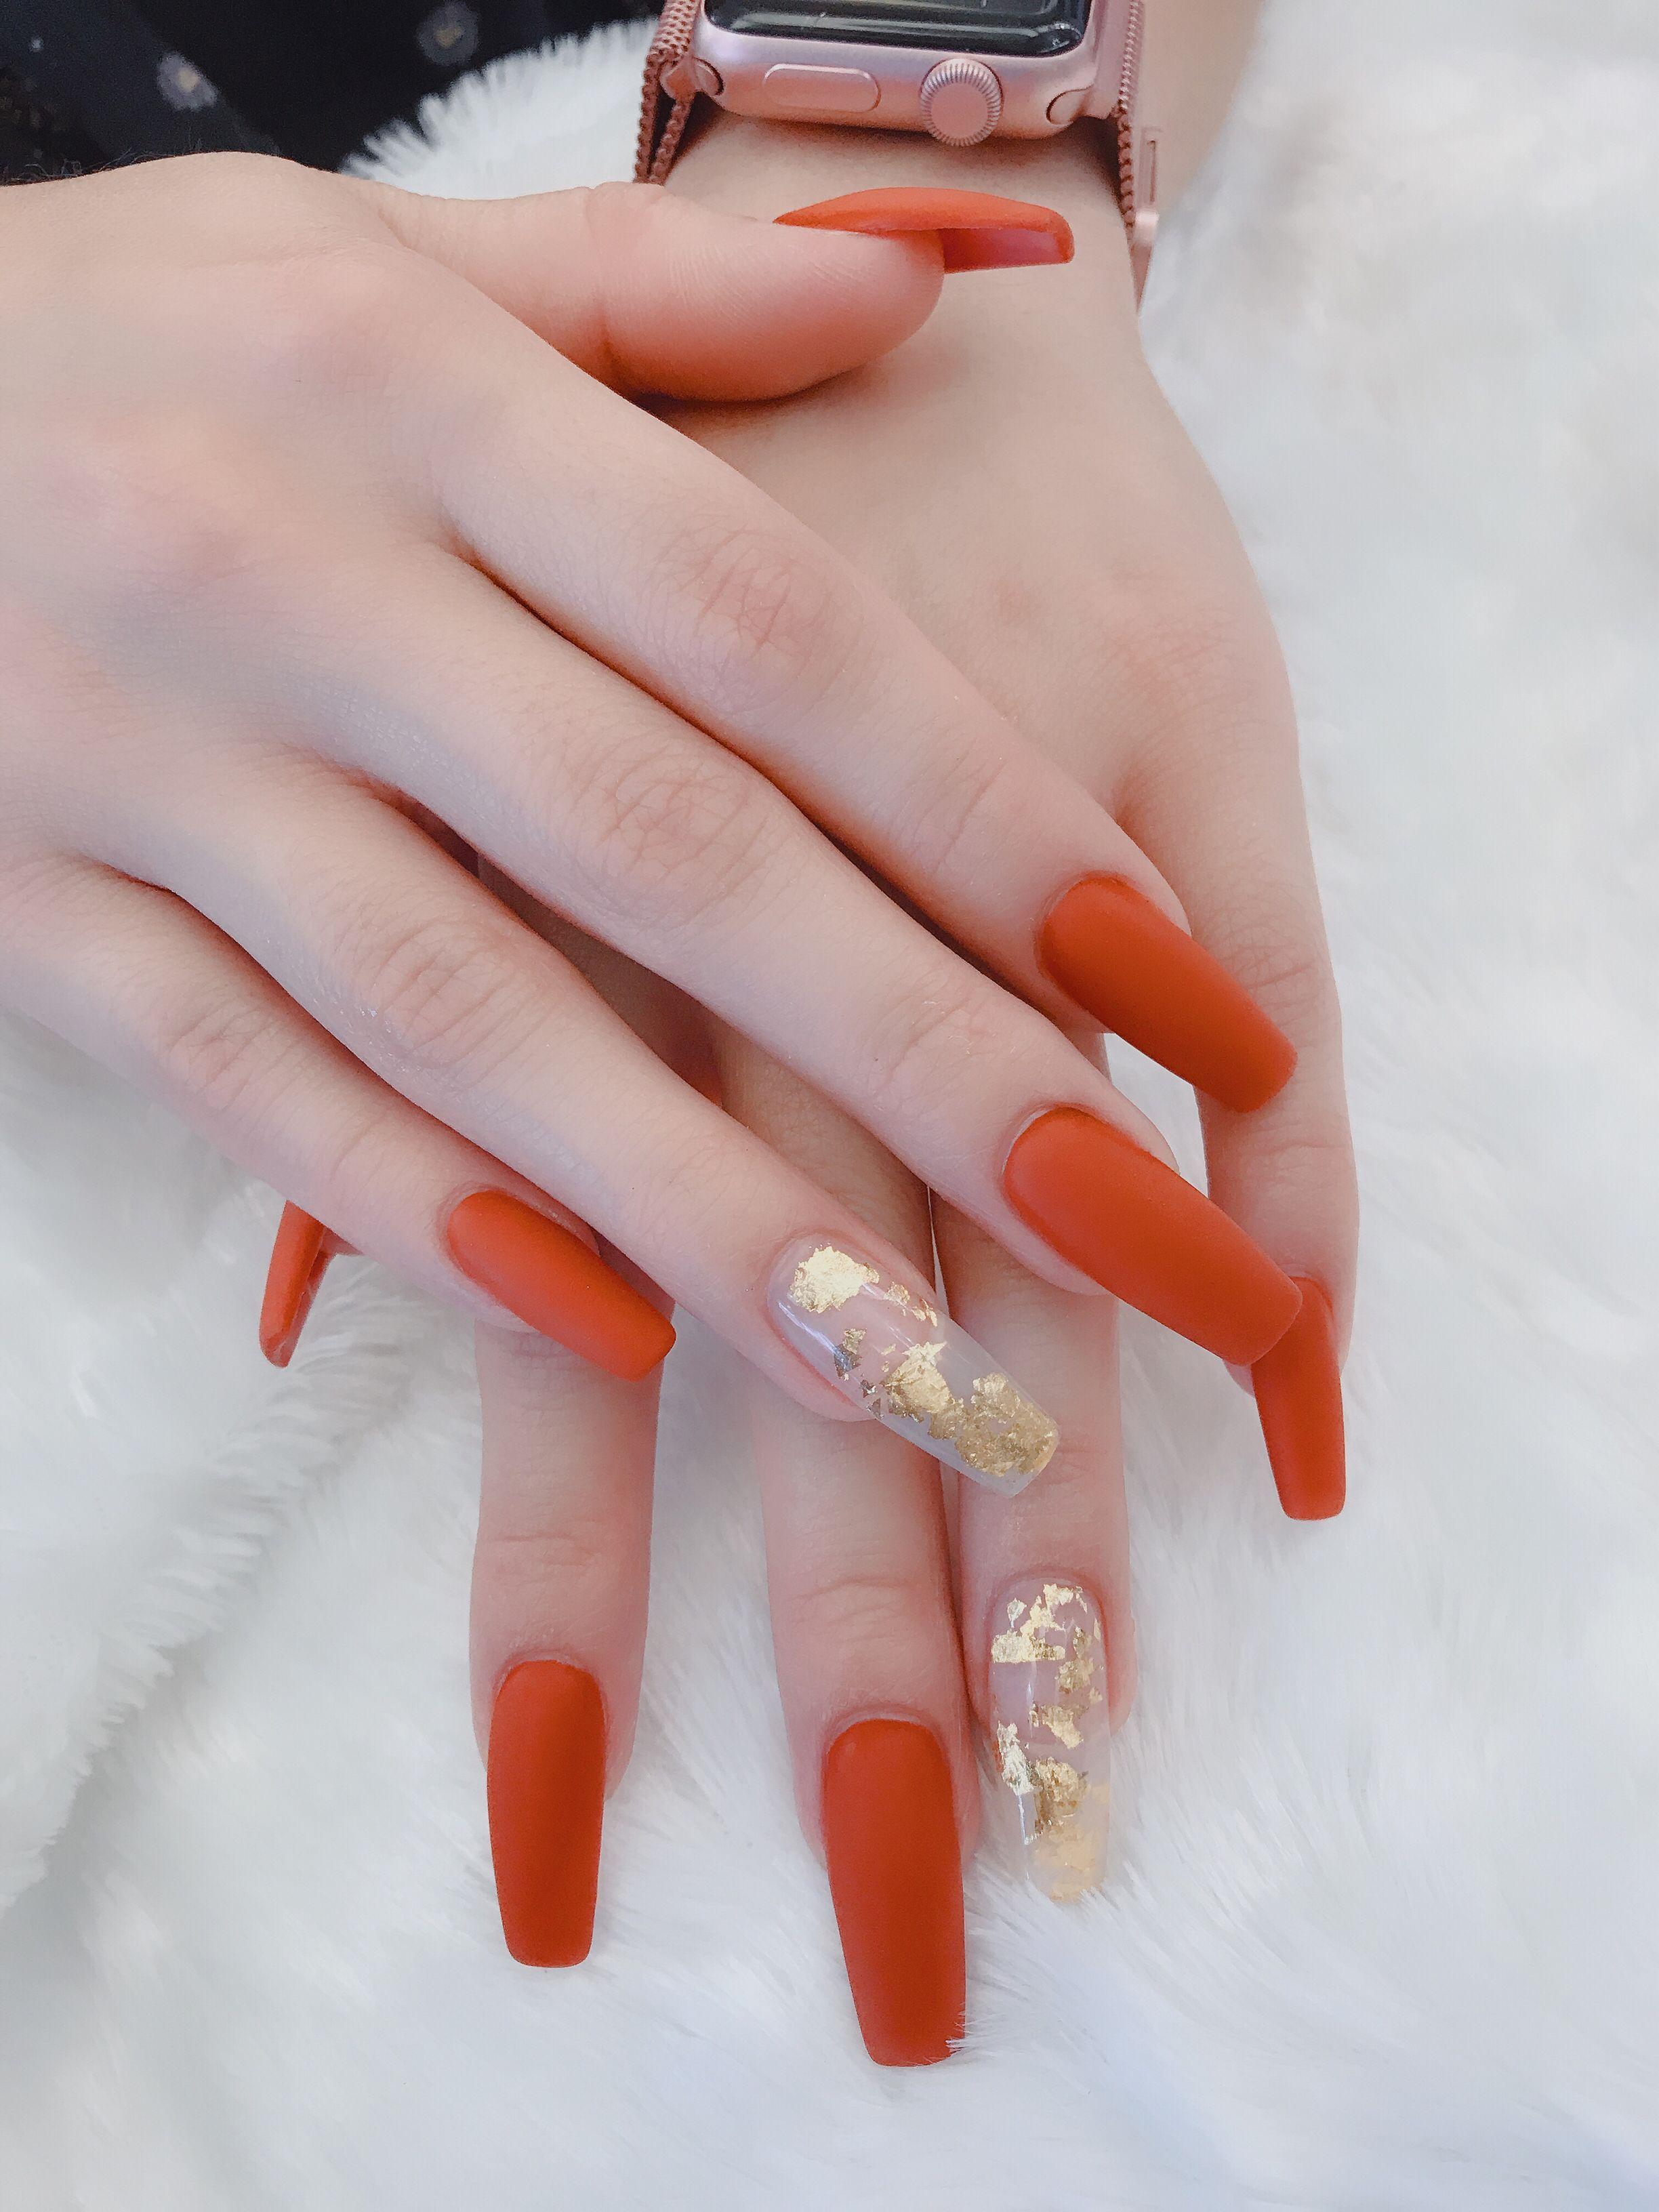 Pinterest Elyy Instagram Elyyanna Fall Acrylic Nails October Nails Fall Nail Art Designs